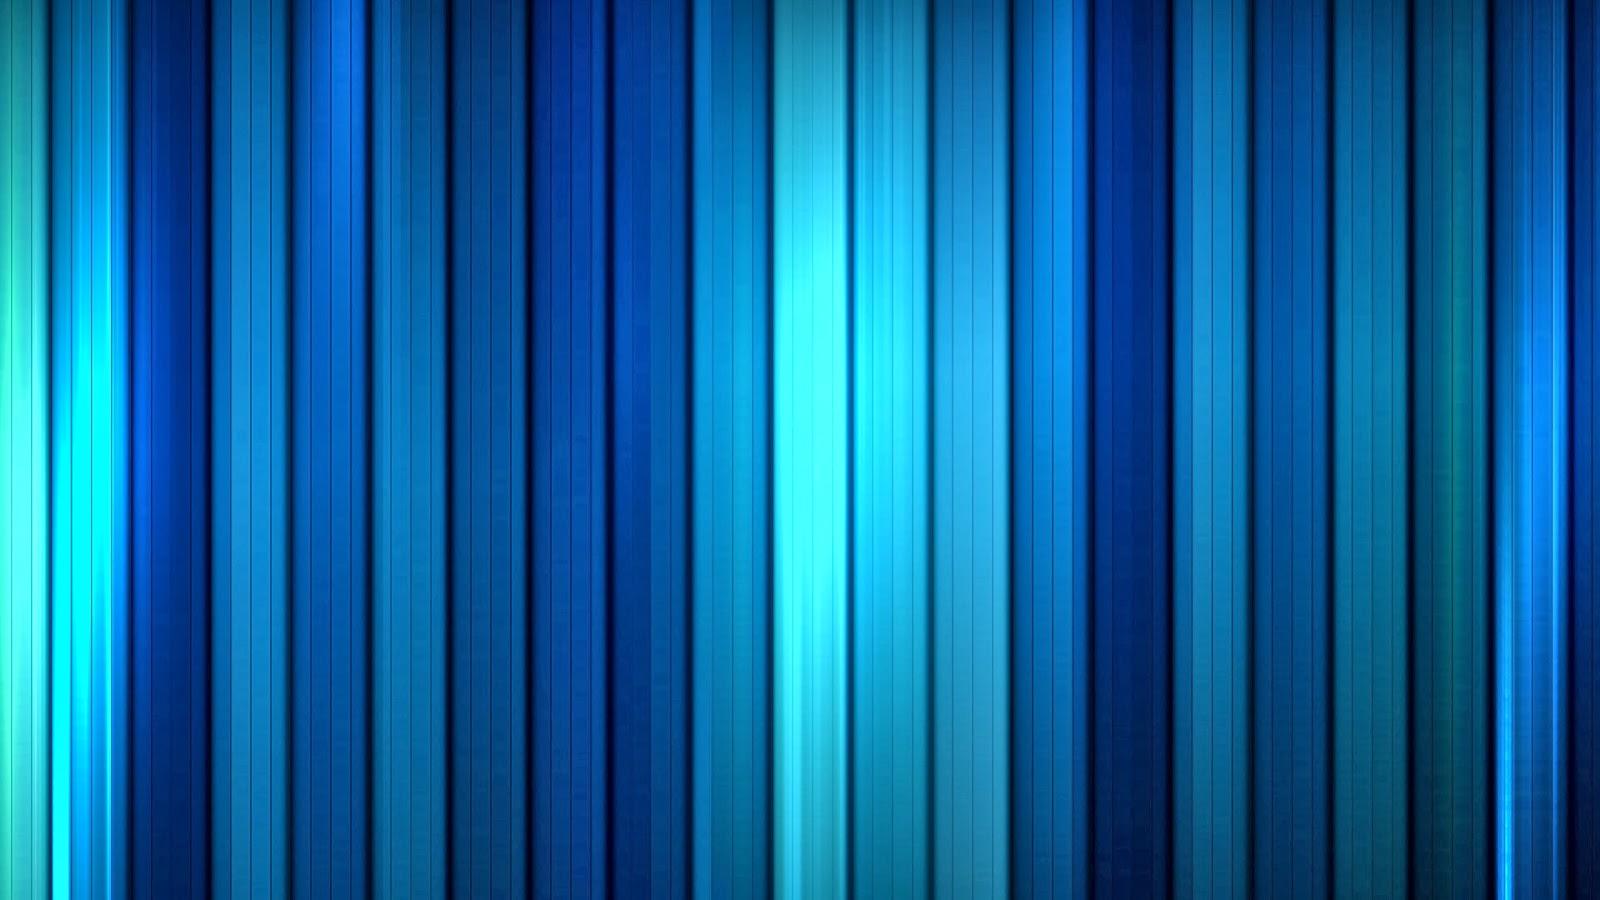 Bricoles et girandoles le bleu - Couleur bleu ou bleue ...